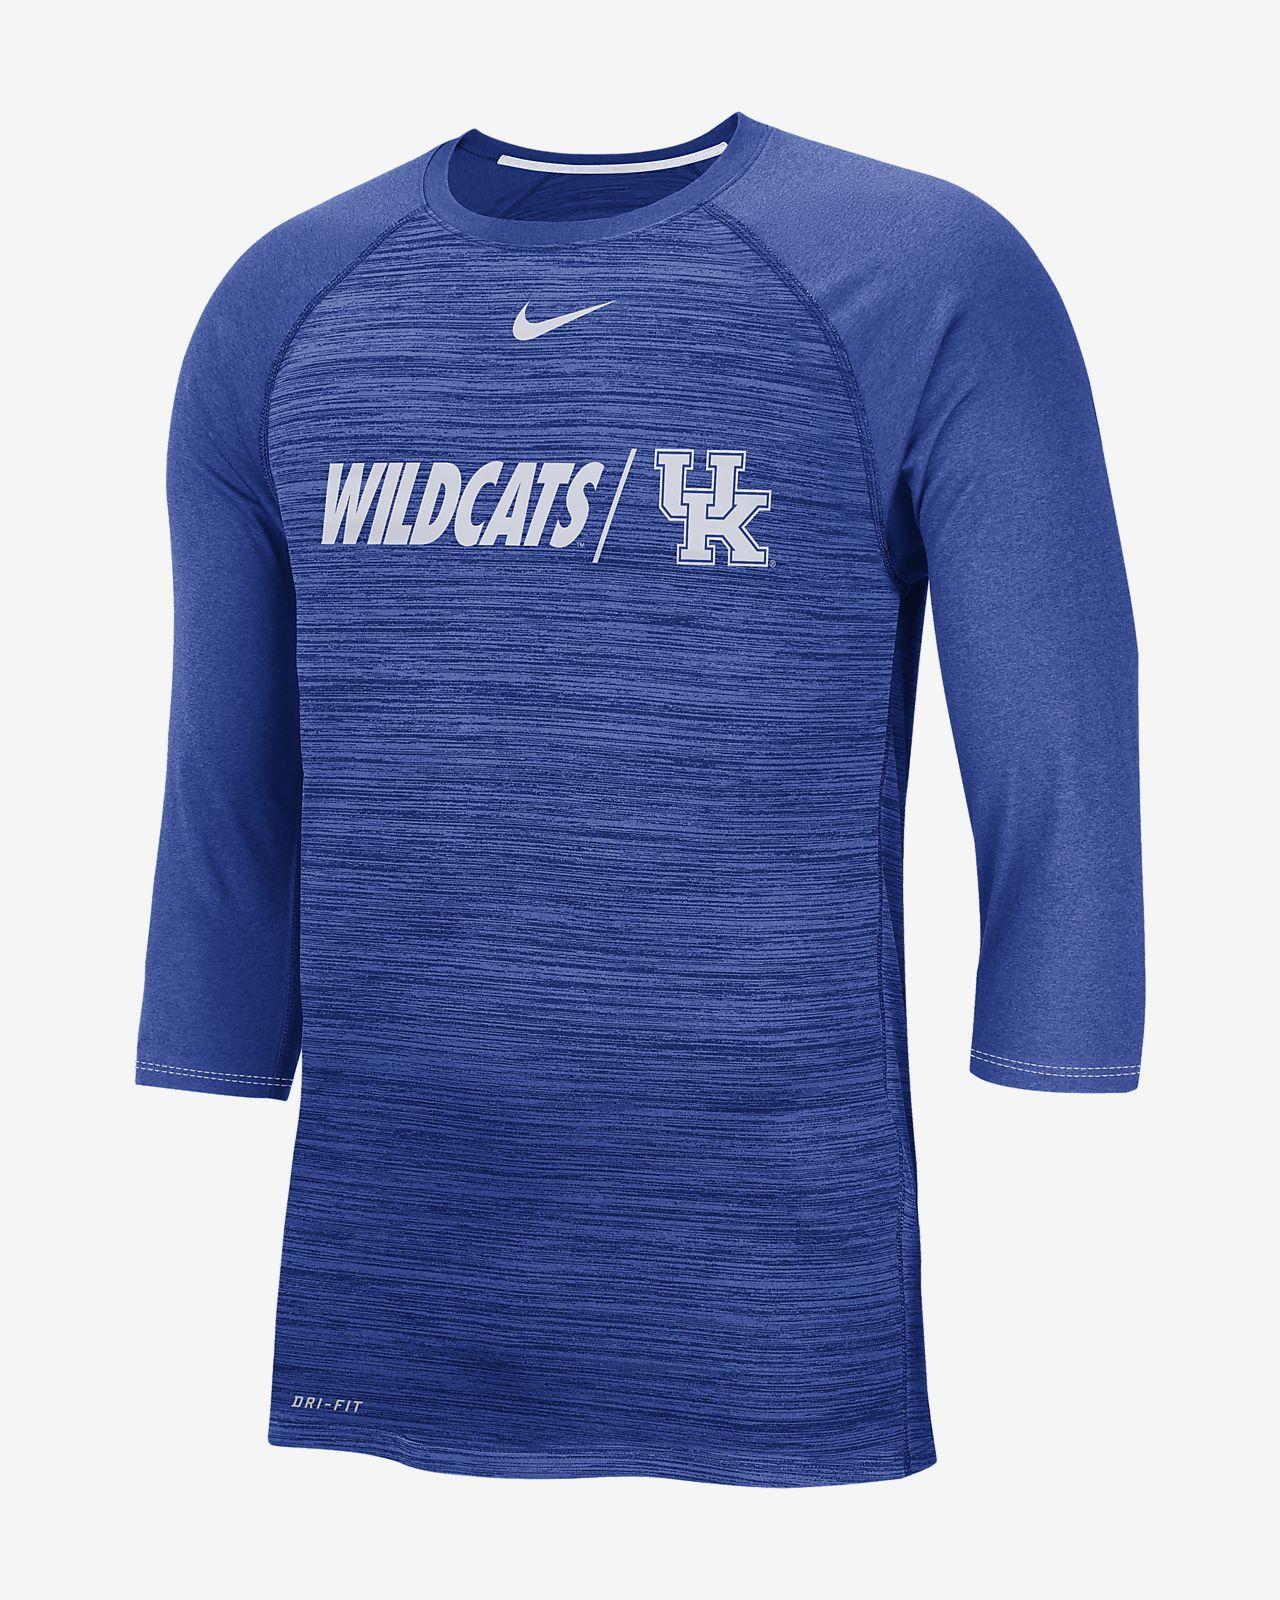 99cfee94 Nike College Dri-FIT Legend (Kentucky) Men's 3/4-Sleeve Top. Nike.com